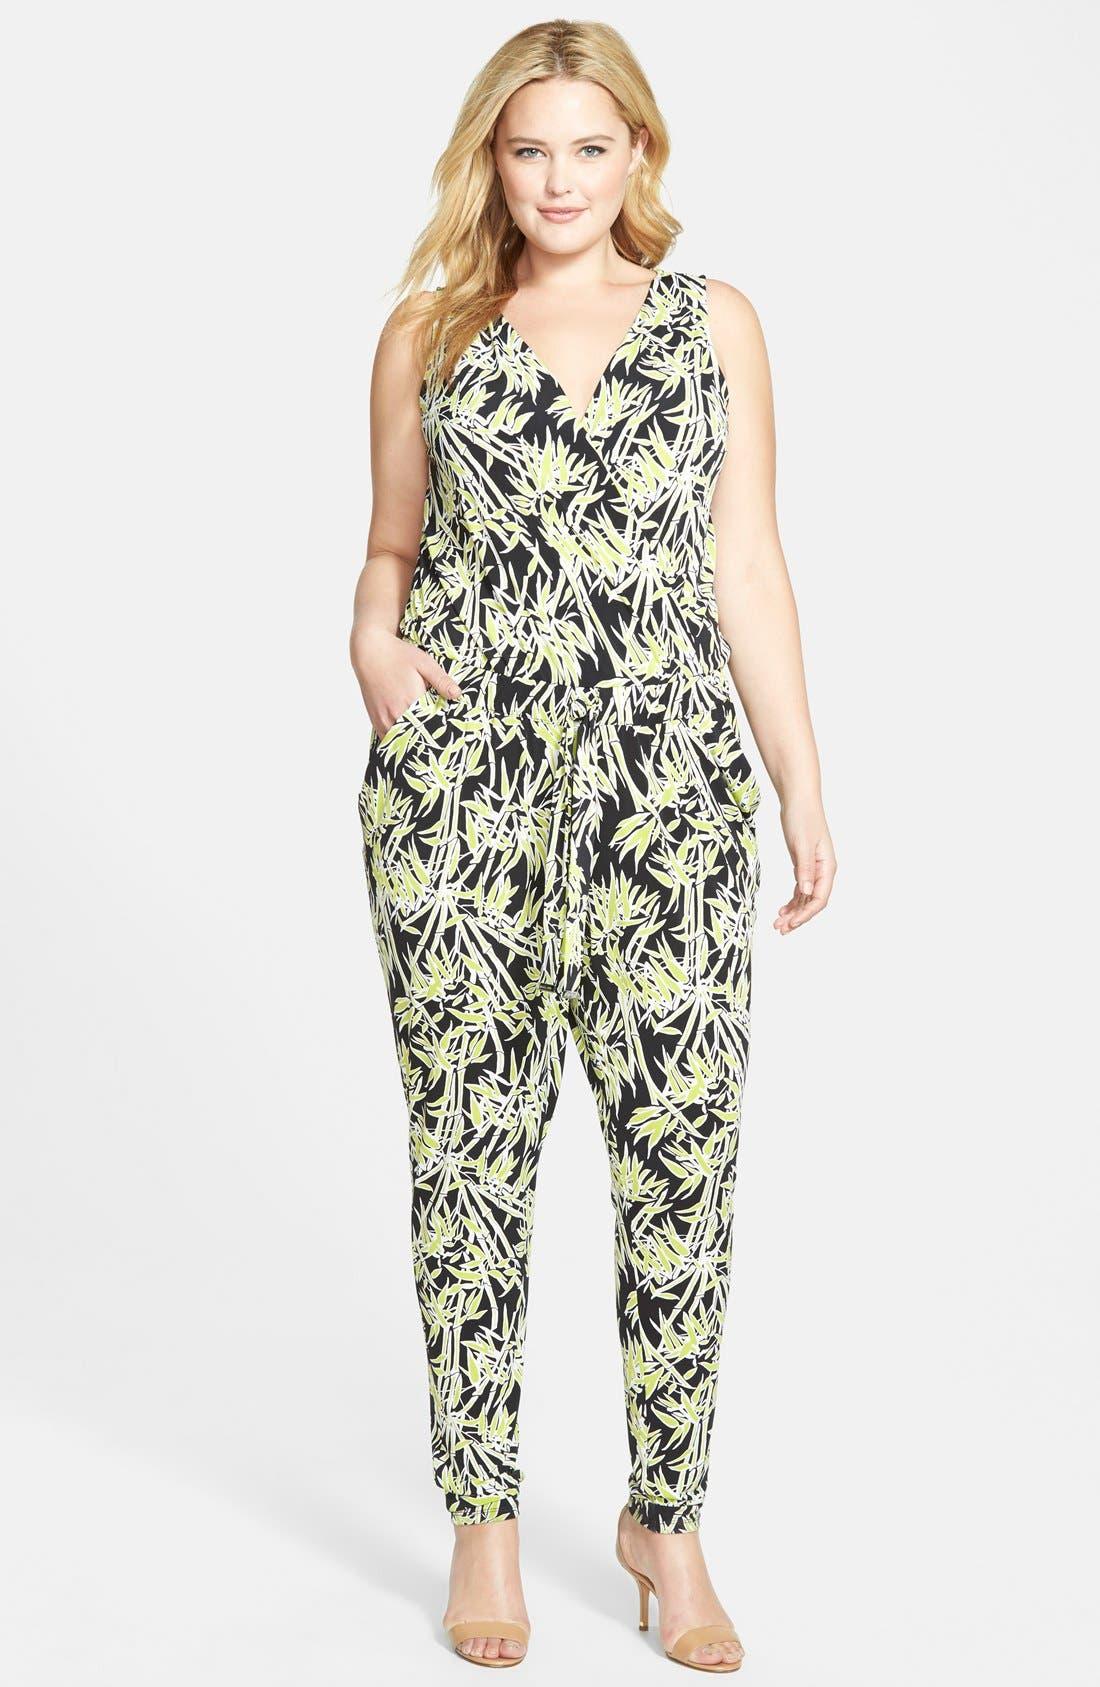 Alternate Image 1 Selected - MICHAEL Michael Kors Bamboo Print Surplice Jersey Jumpsuit (Plus Size)